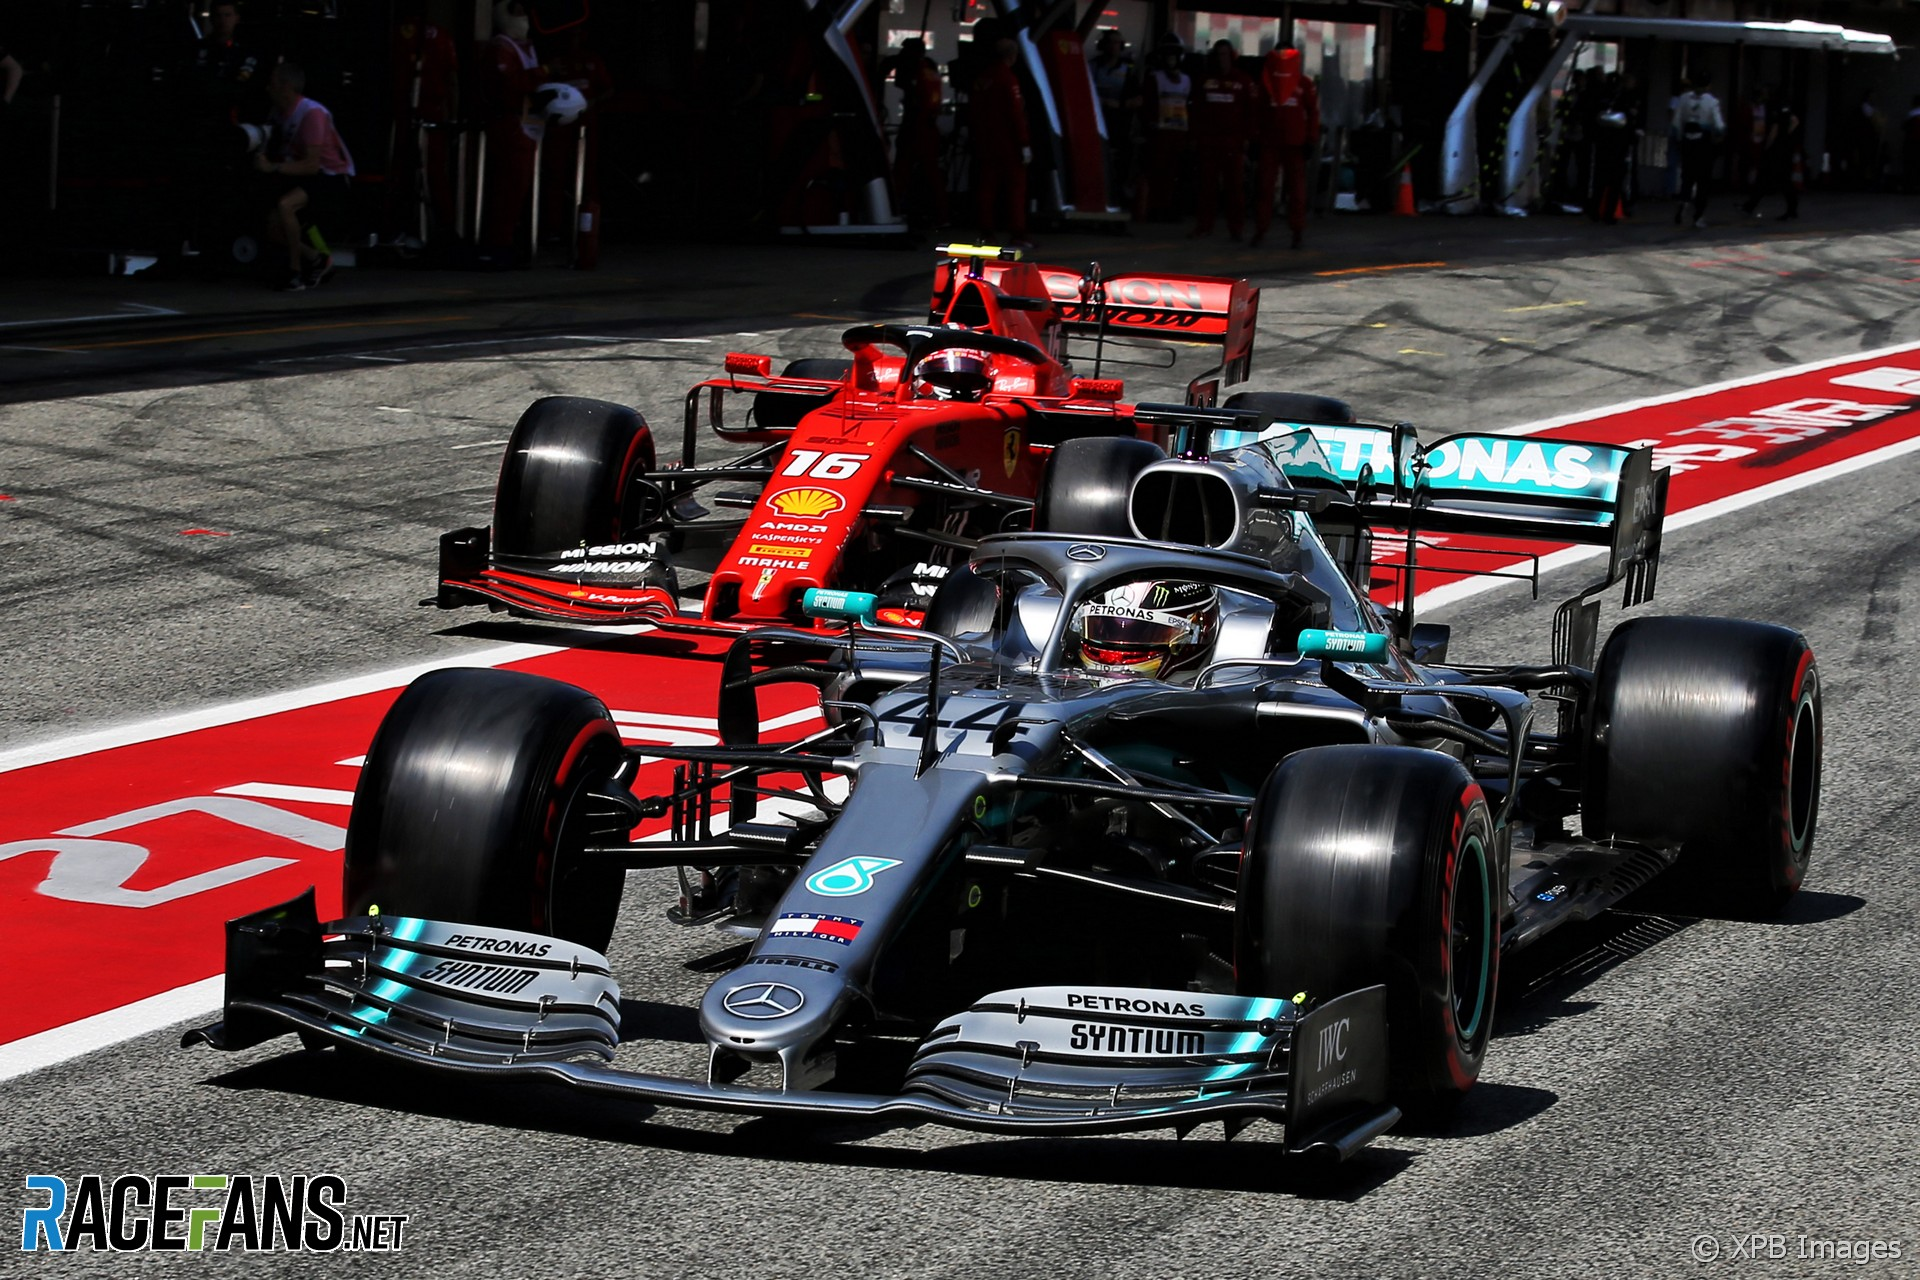 Lewis Hamilton, Charles Leclerc, Circuit de Catalunya, 2019